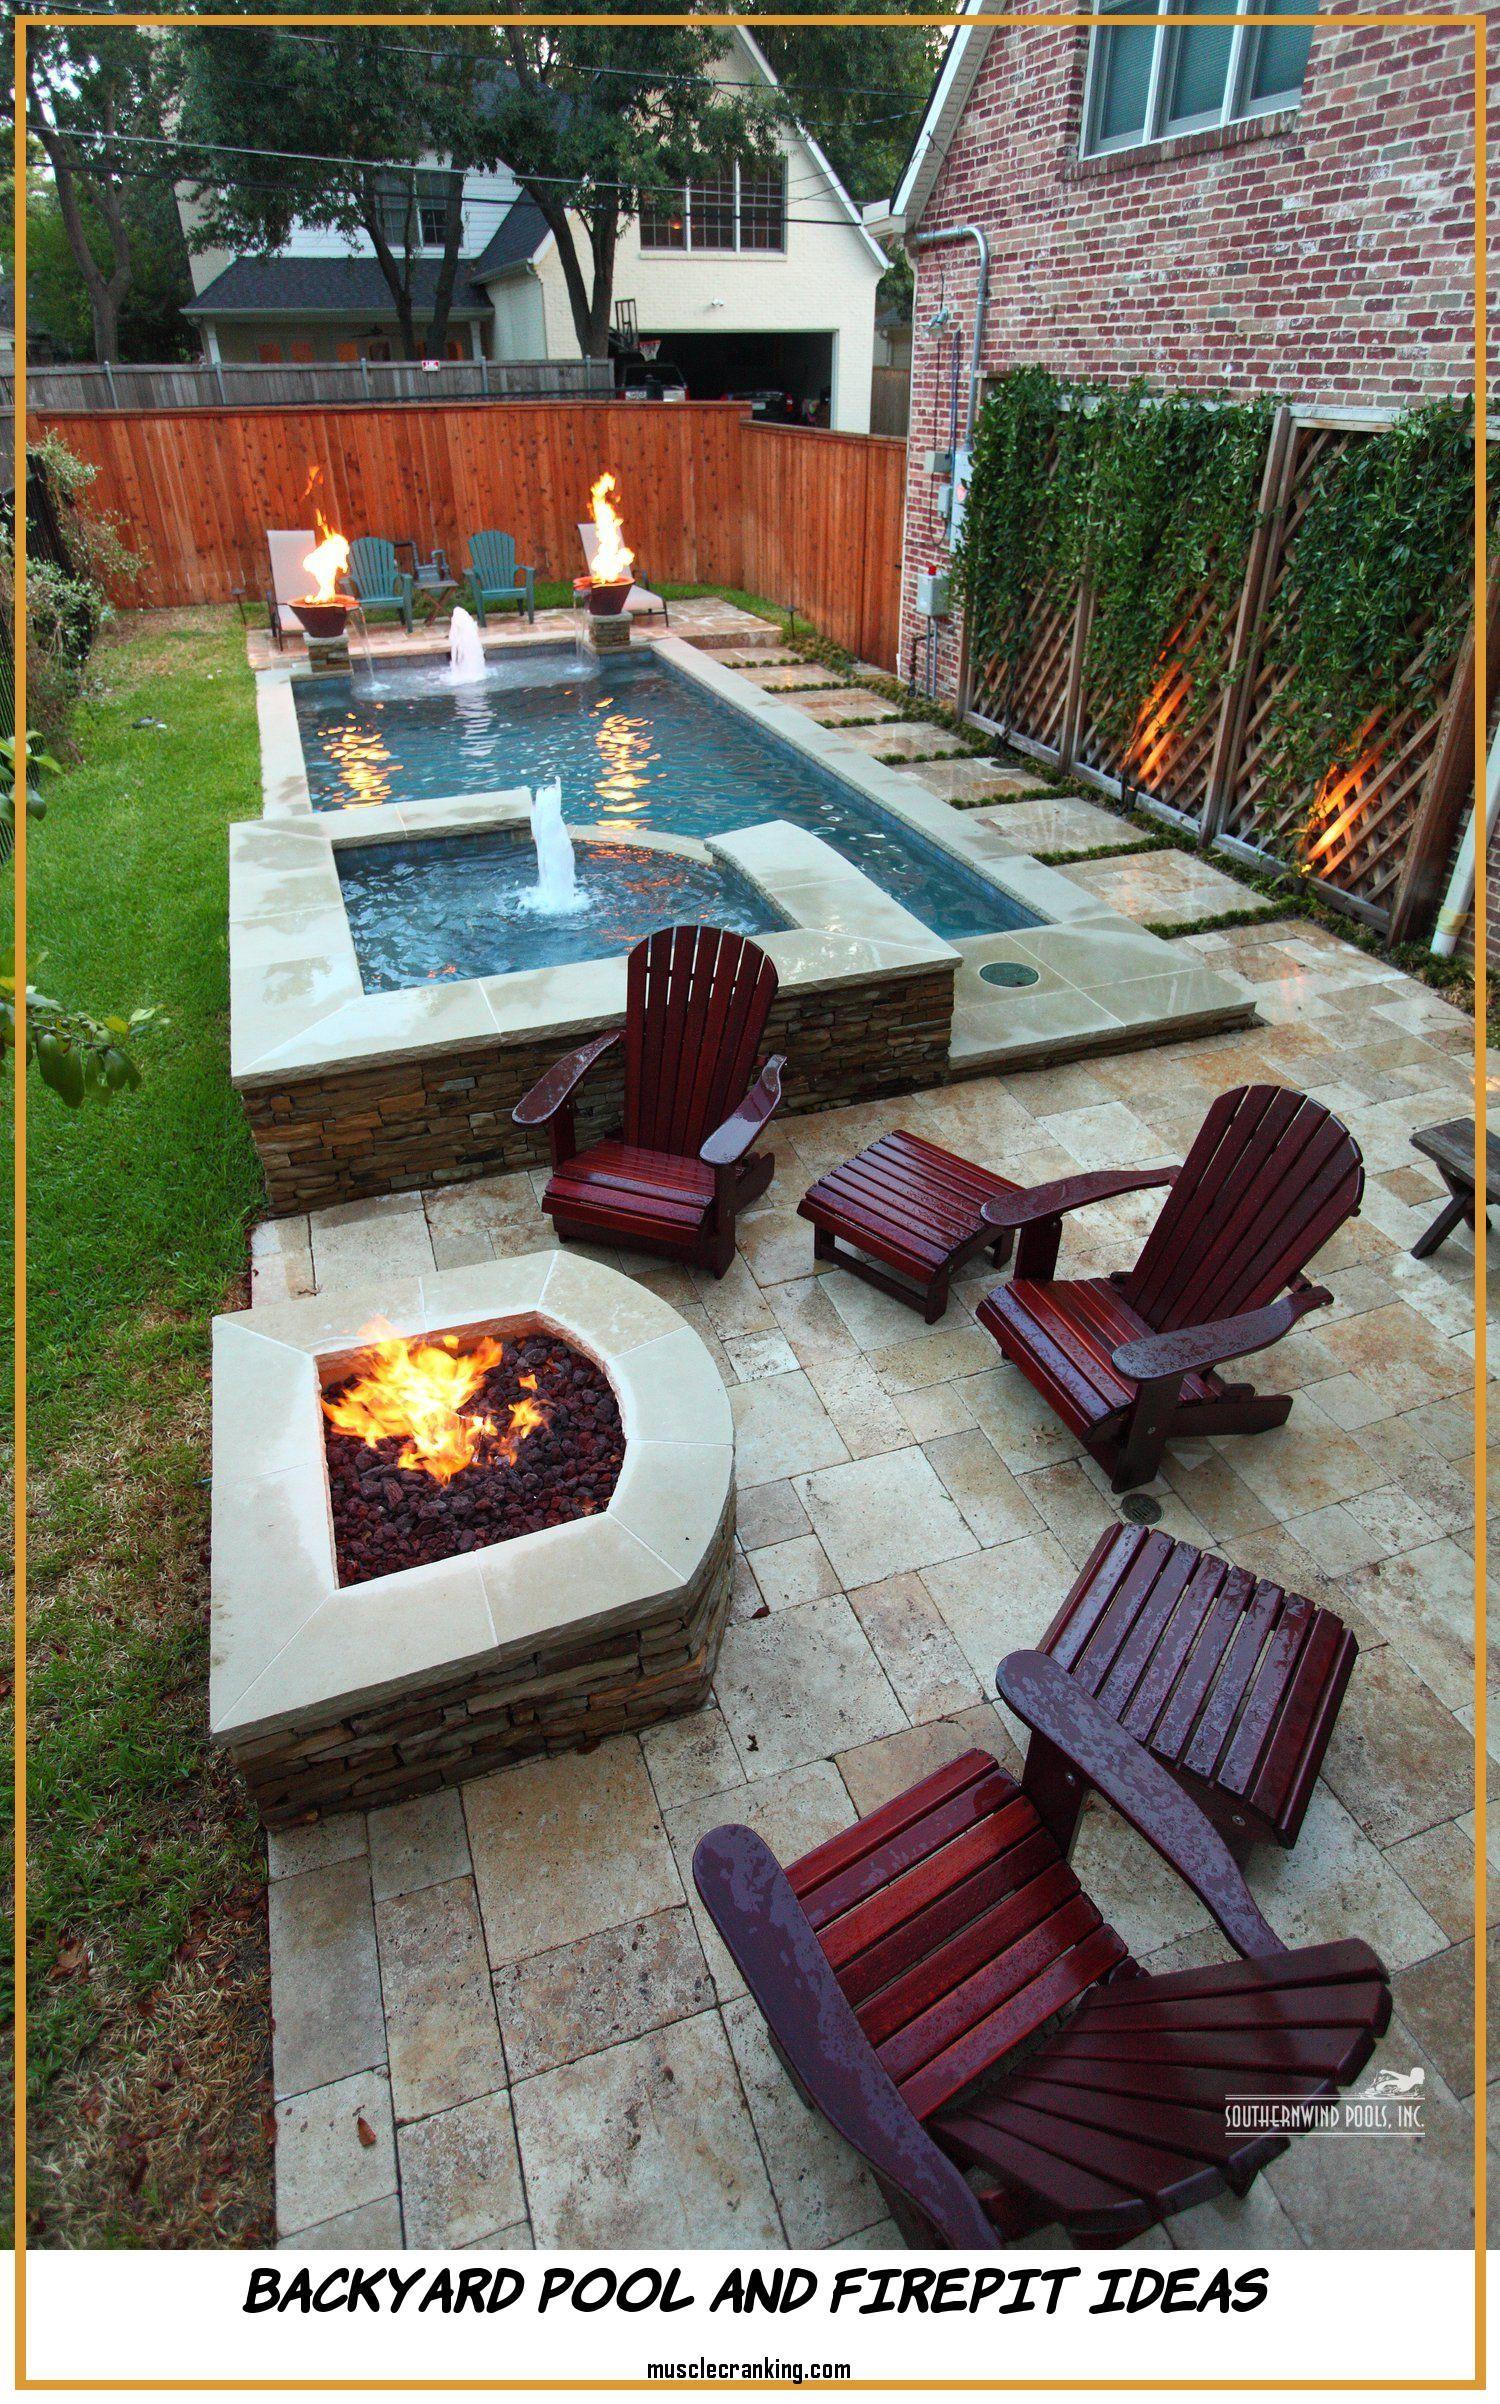 Backyard Pool And Firepit Ideas 2021 Backyard Patio Small Backyard Pools Small Patio Design